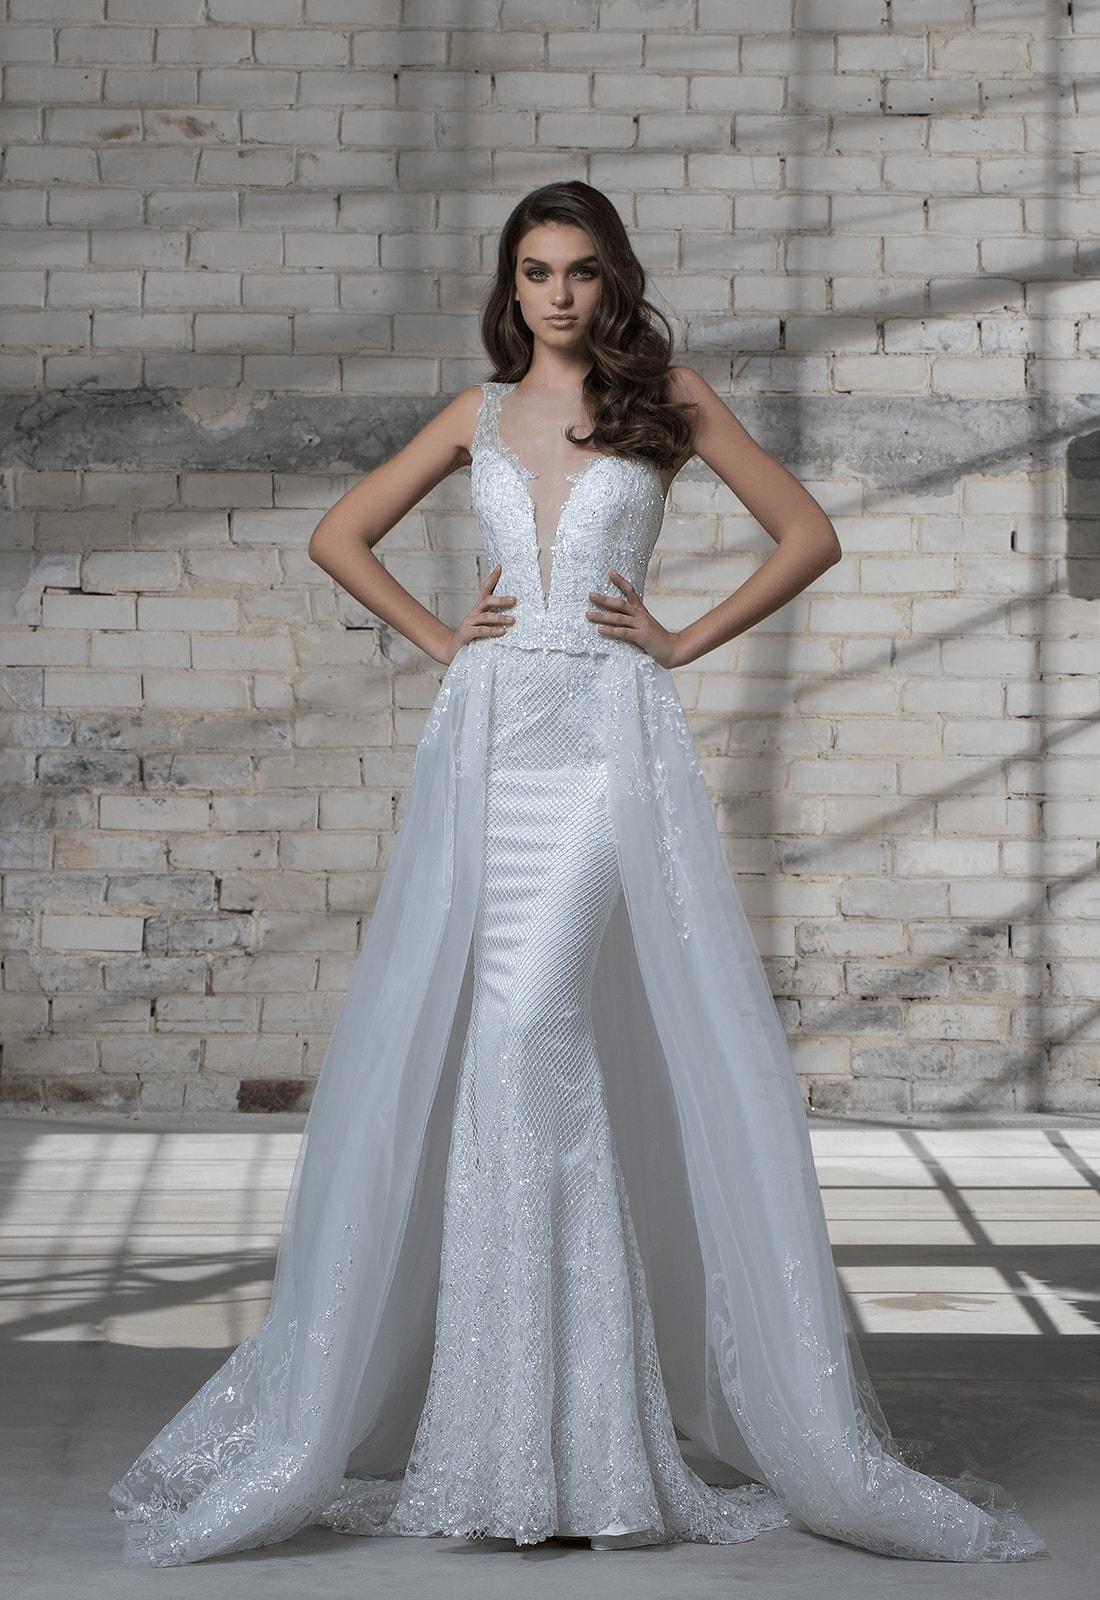 Sleeveless Beaded Sheath Wedding Dress With Deep V-neckline And ...